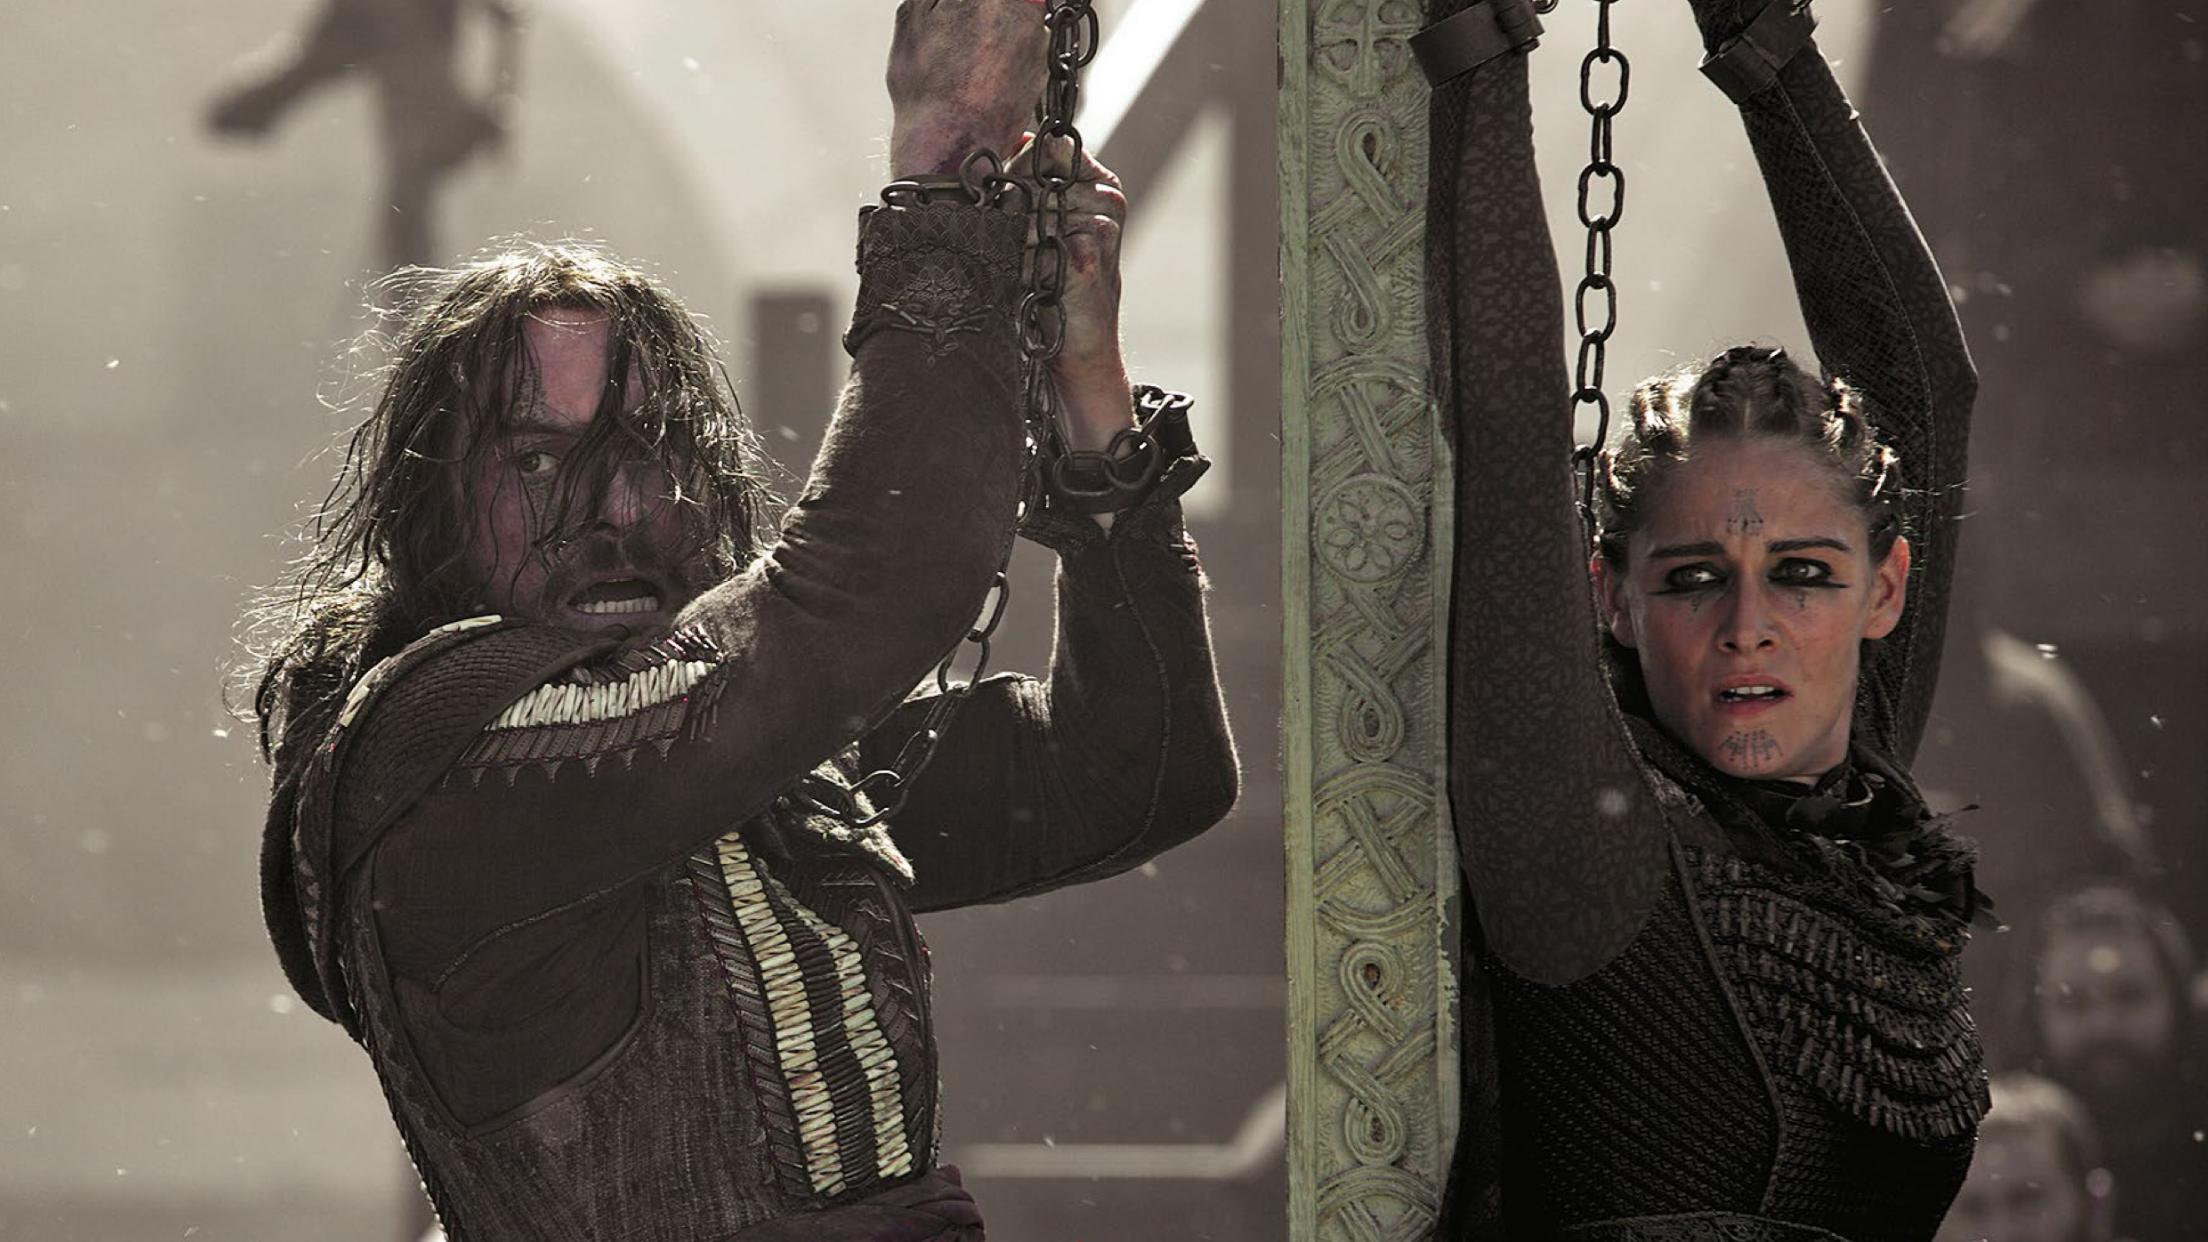 Aguilar and Maria - Execution